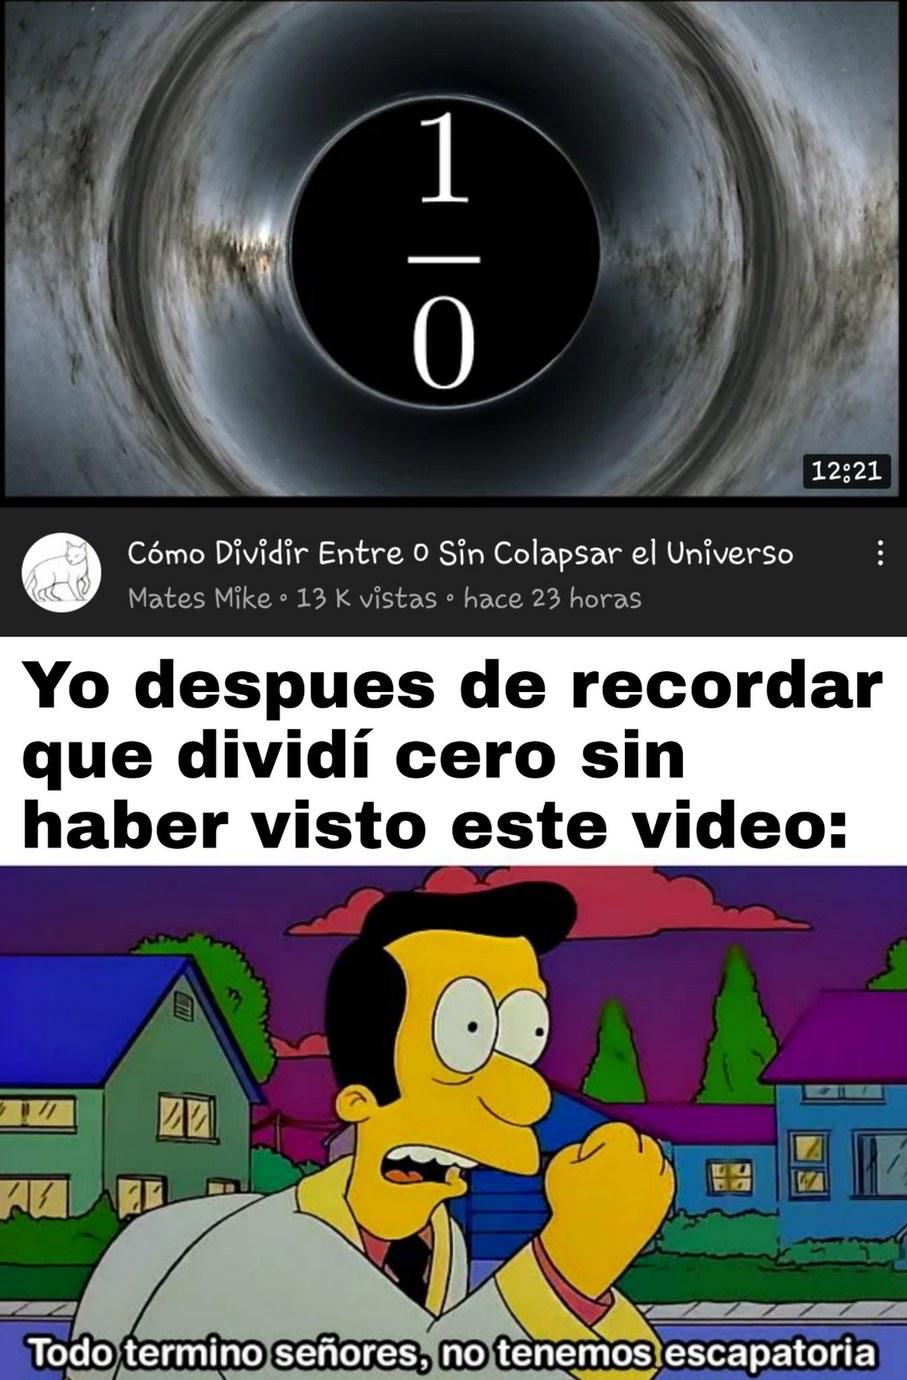 14÷0 *procede a colapsar el universo* - meme